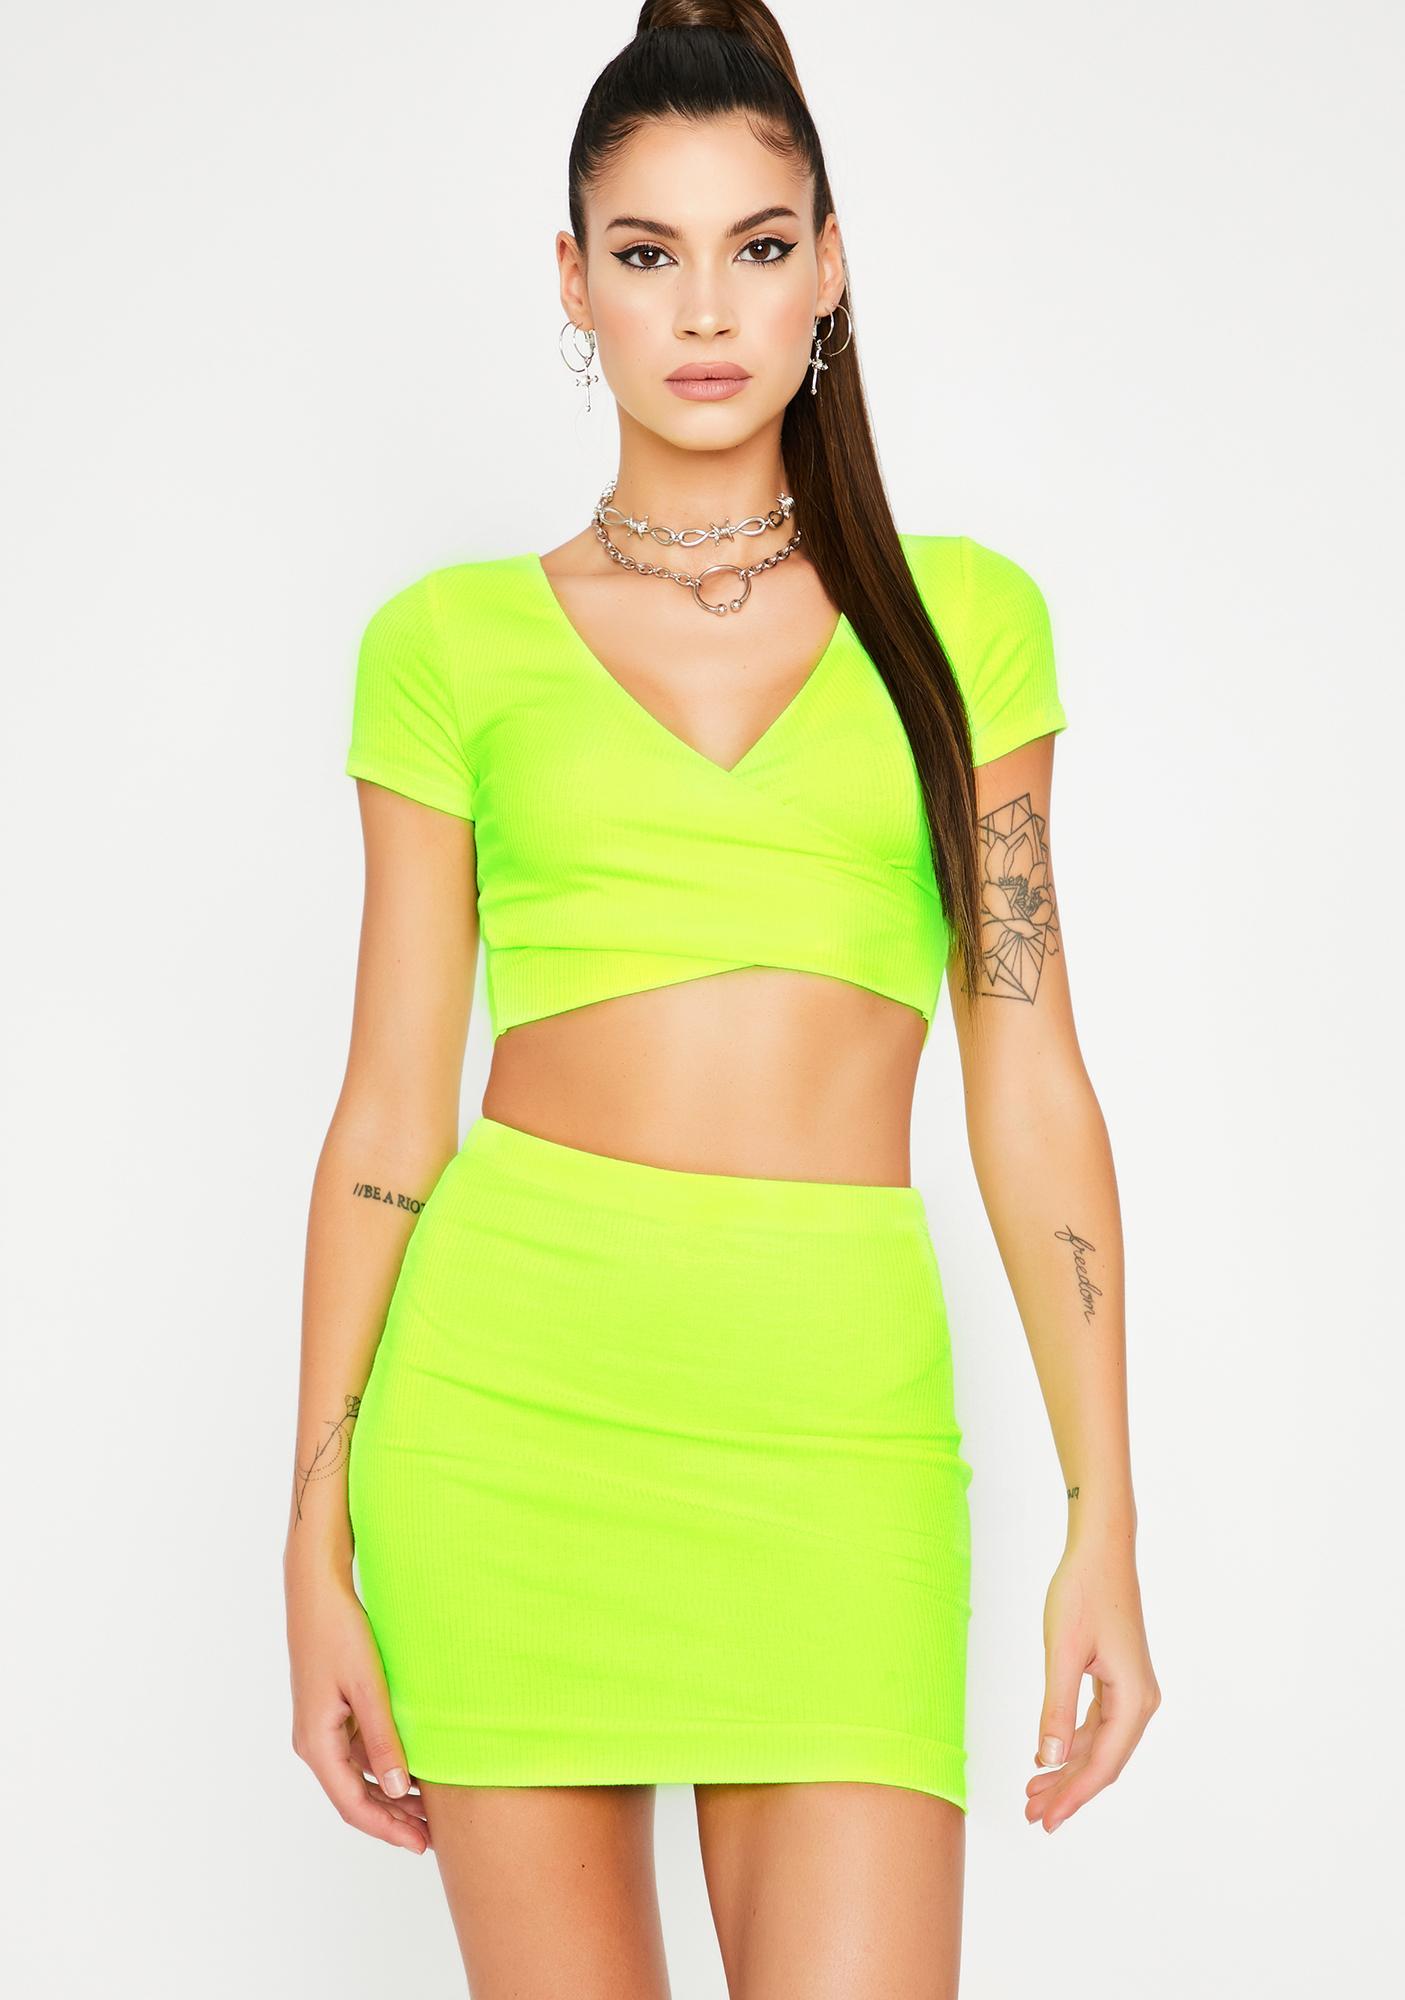 Slime Lowkey Thottie Skirt Set